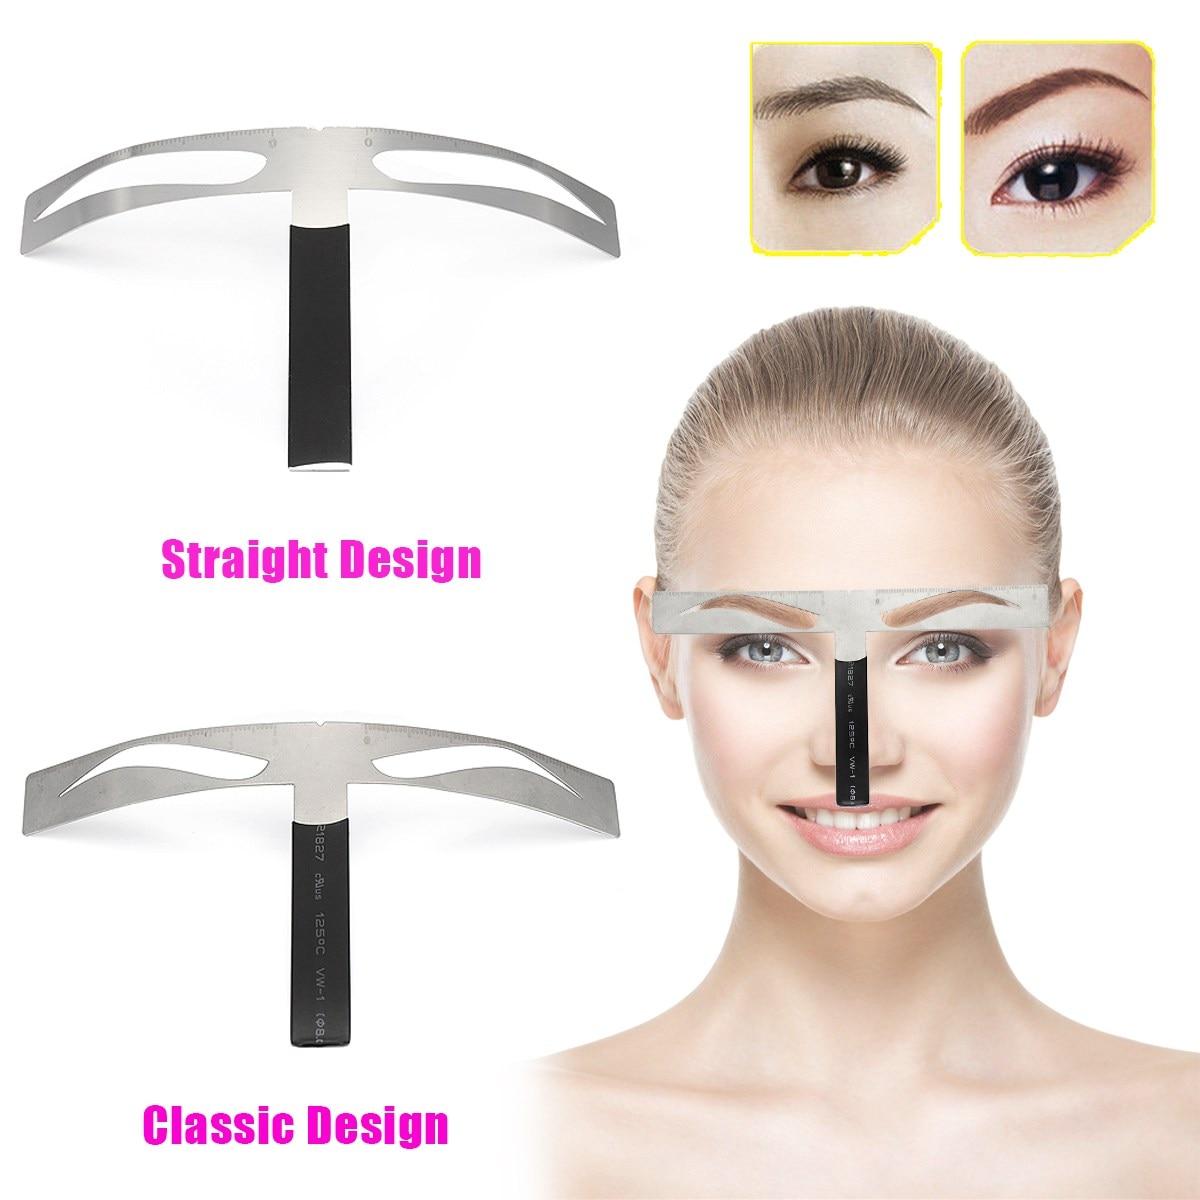 Microblading Eyebrow Balance Ruler Metal Tattoo Shaping Stencil Permanent Makeup Caliper Measure Definition Grooming Tool 2018